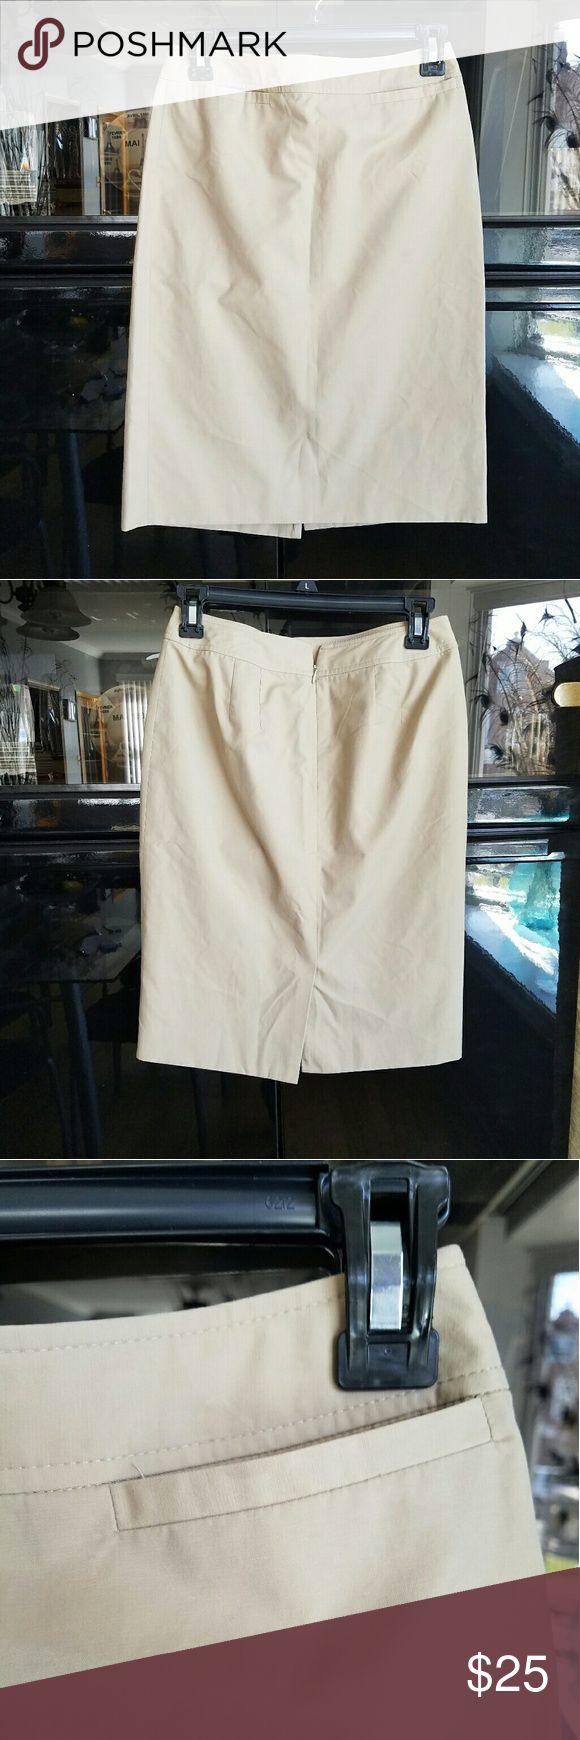 LOFT khaki pencil skirt Size 0P. Khaki skirt.  Offers welcome. LOFT Skirts Pencil